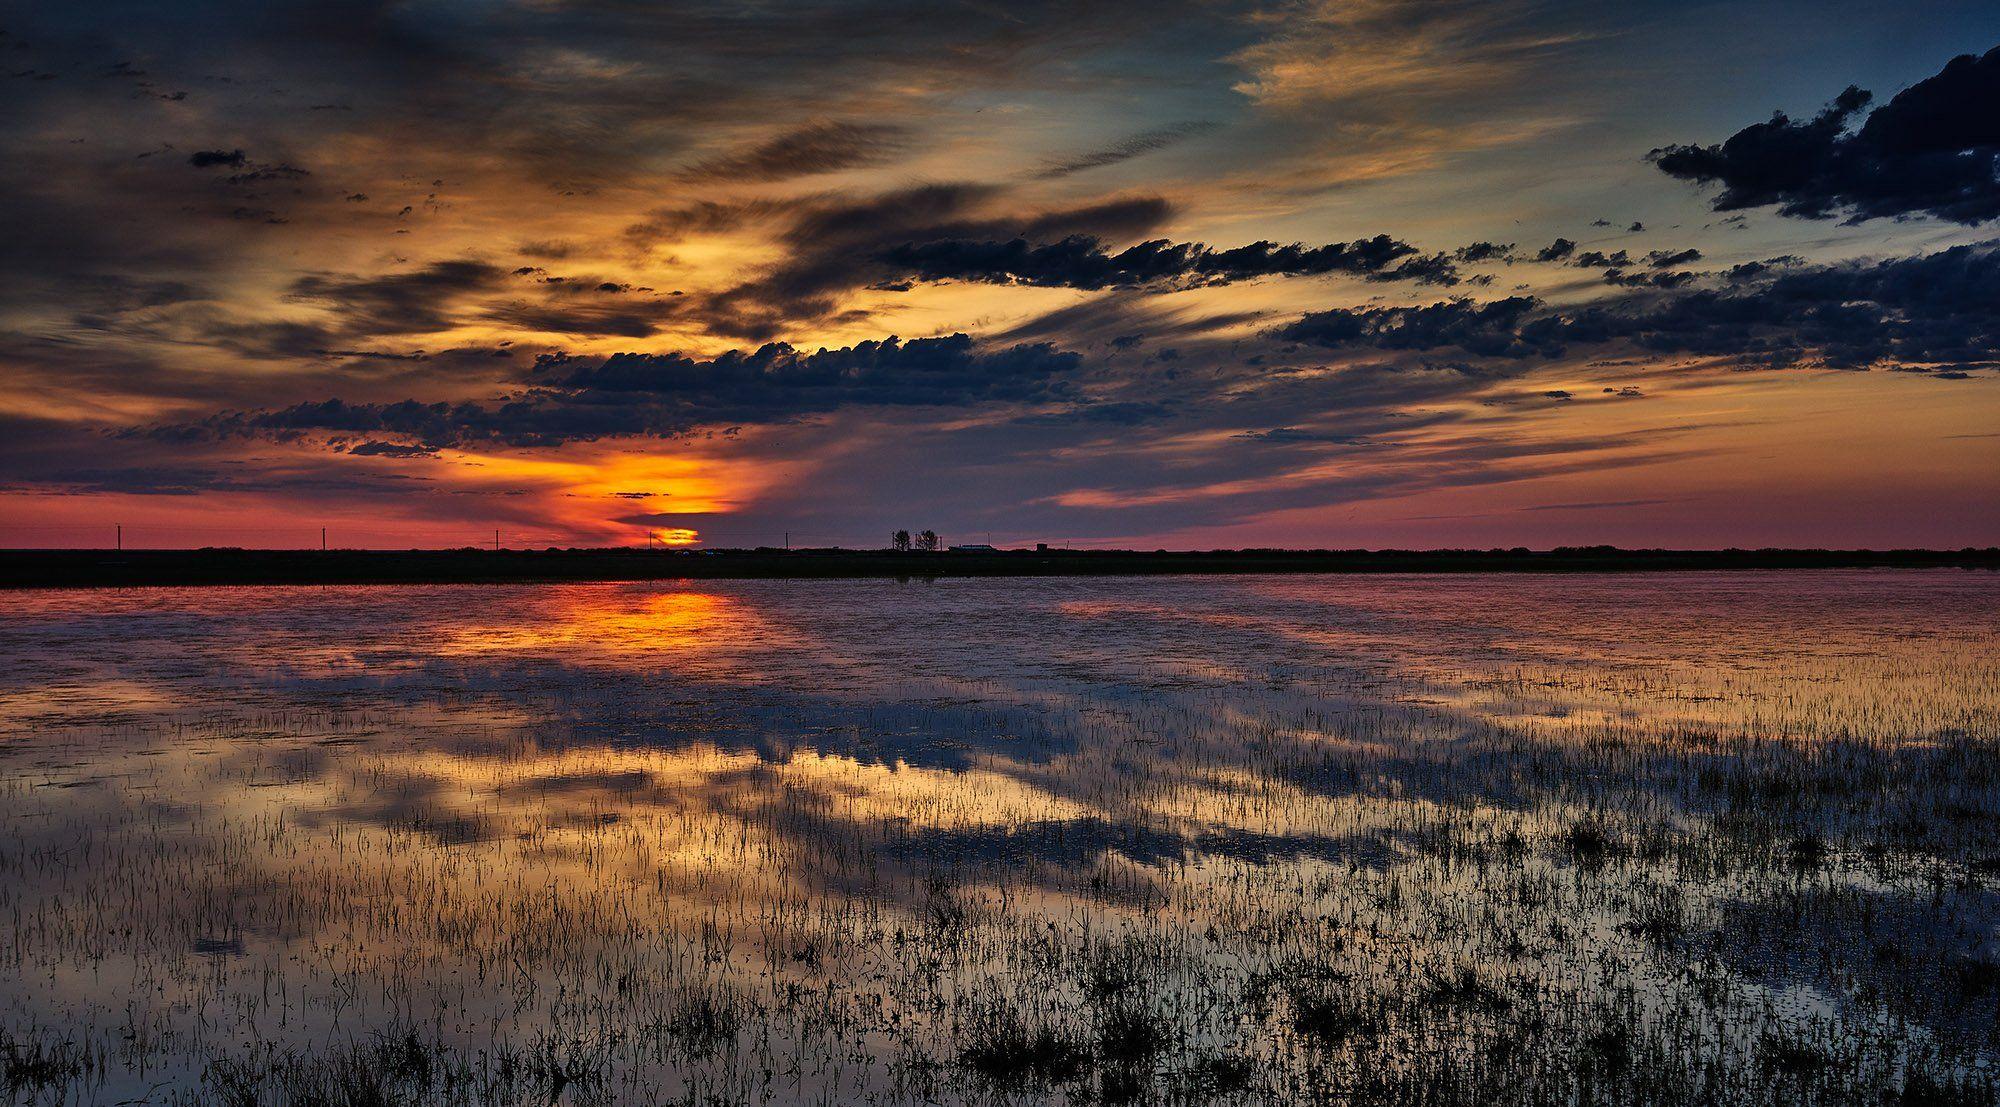 пейзаж закат Казахстан Тургай, Пономарев Андрей